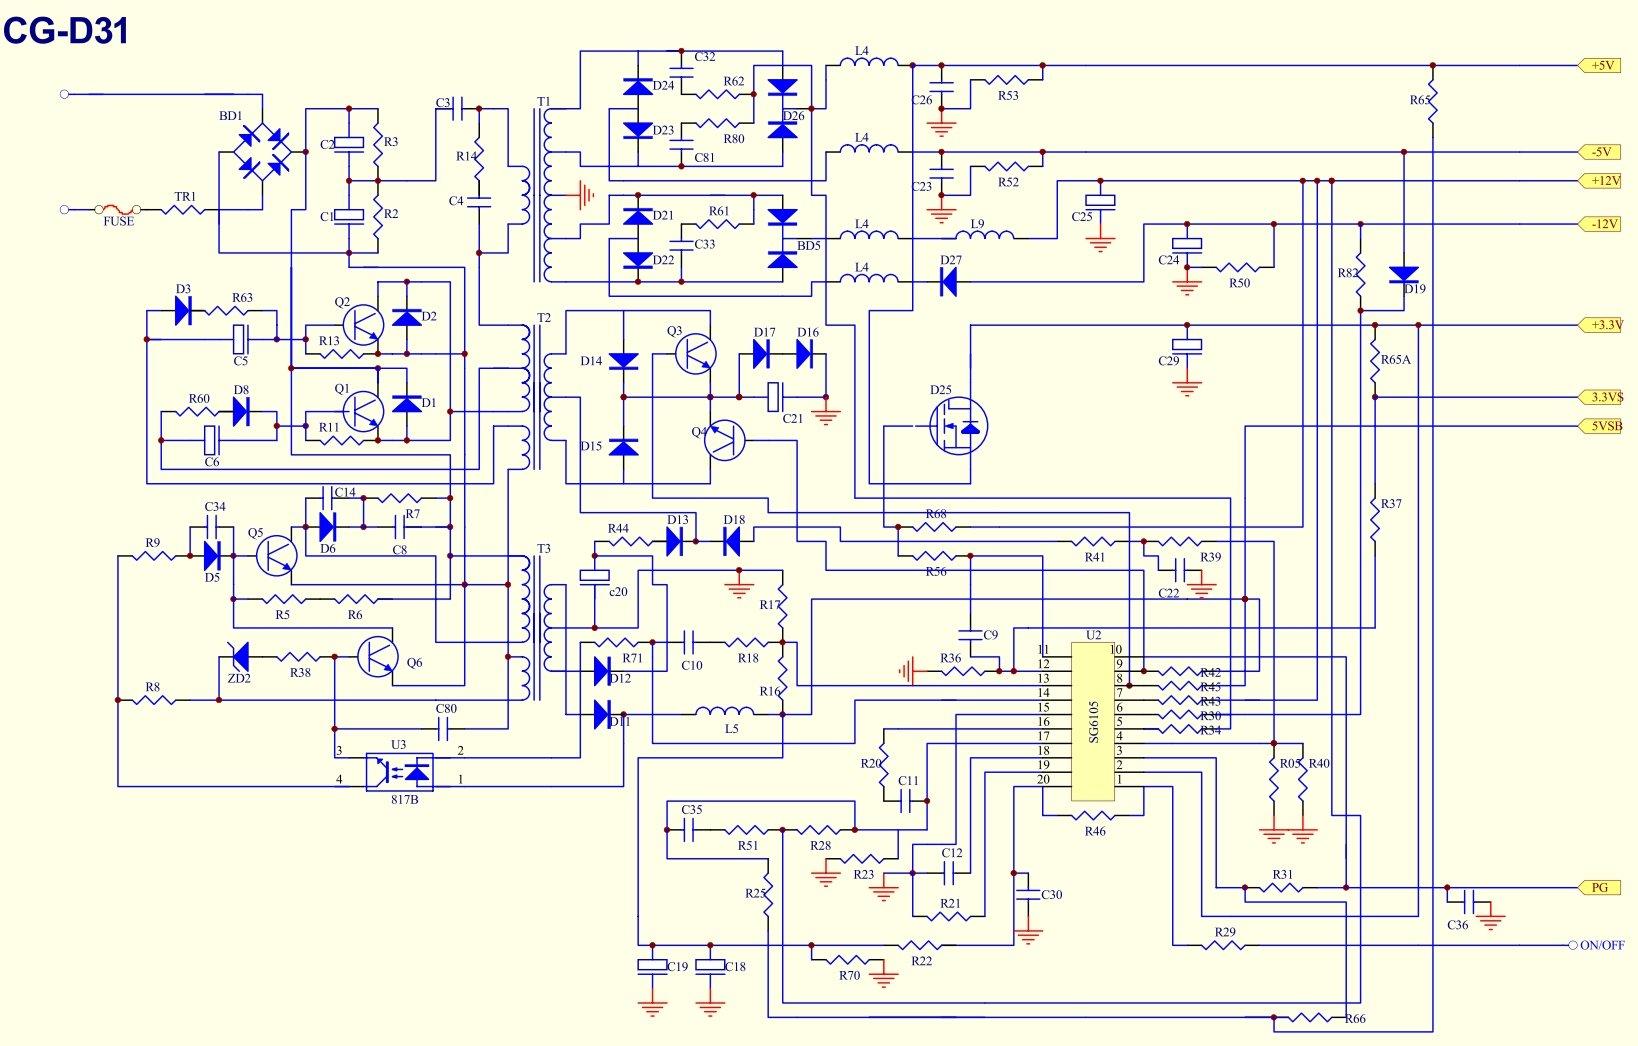 Блок питания atx12v350wp4 схема